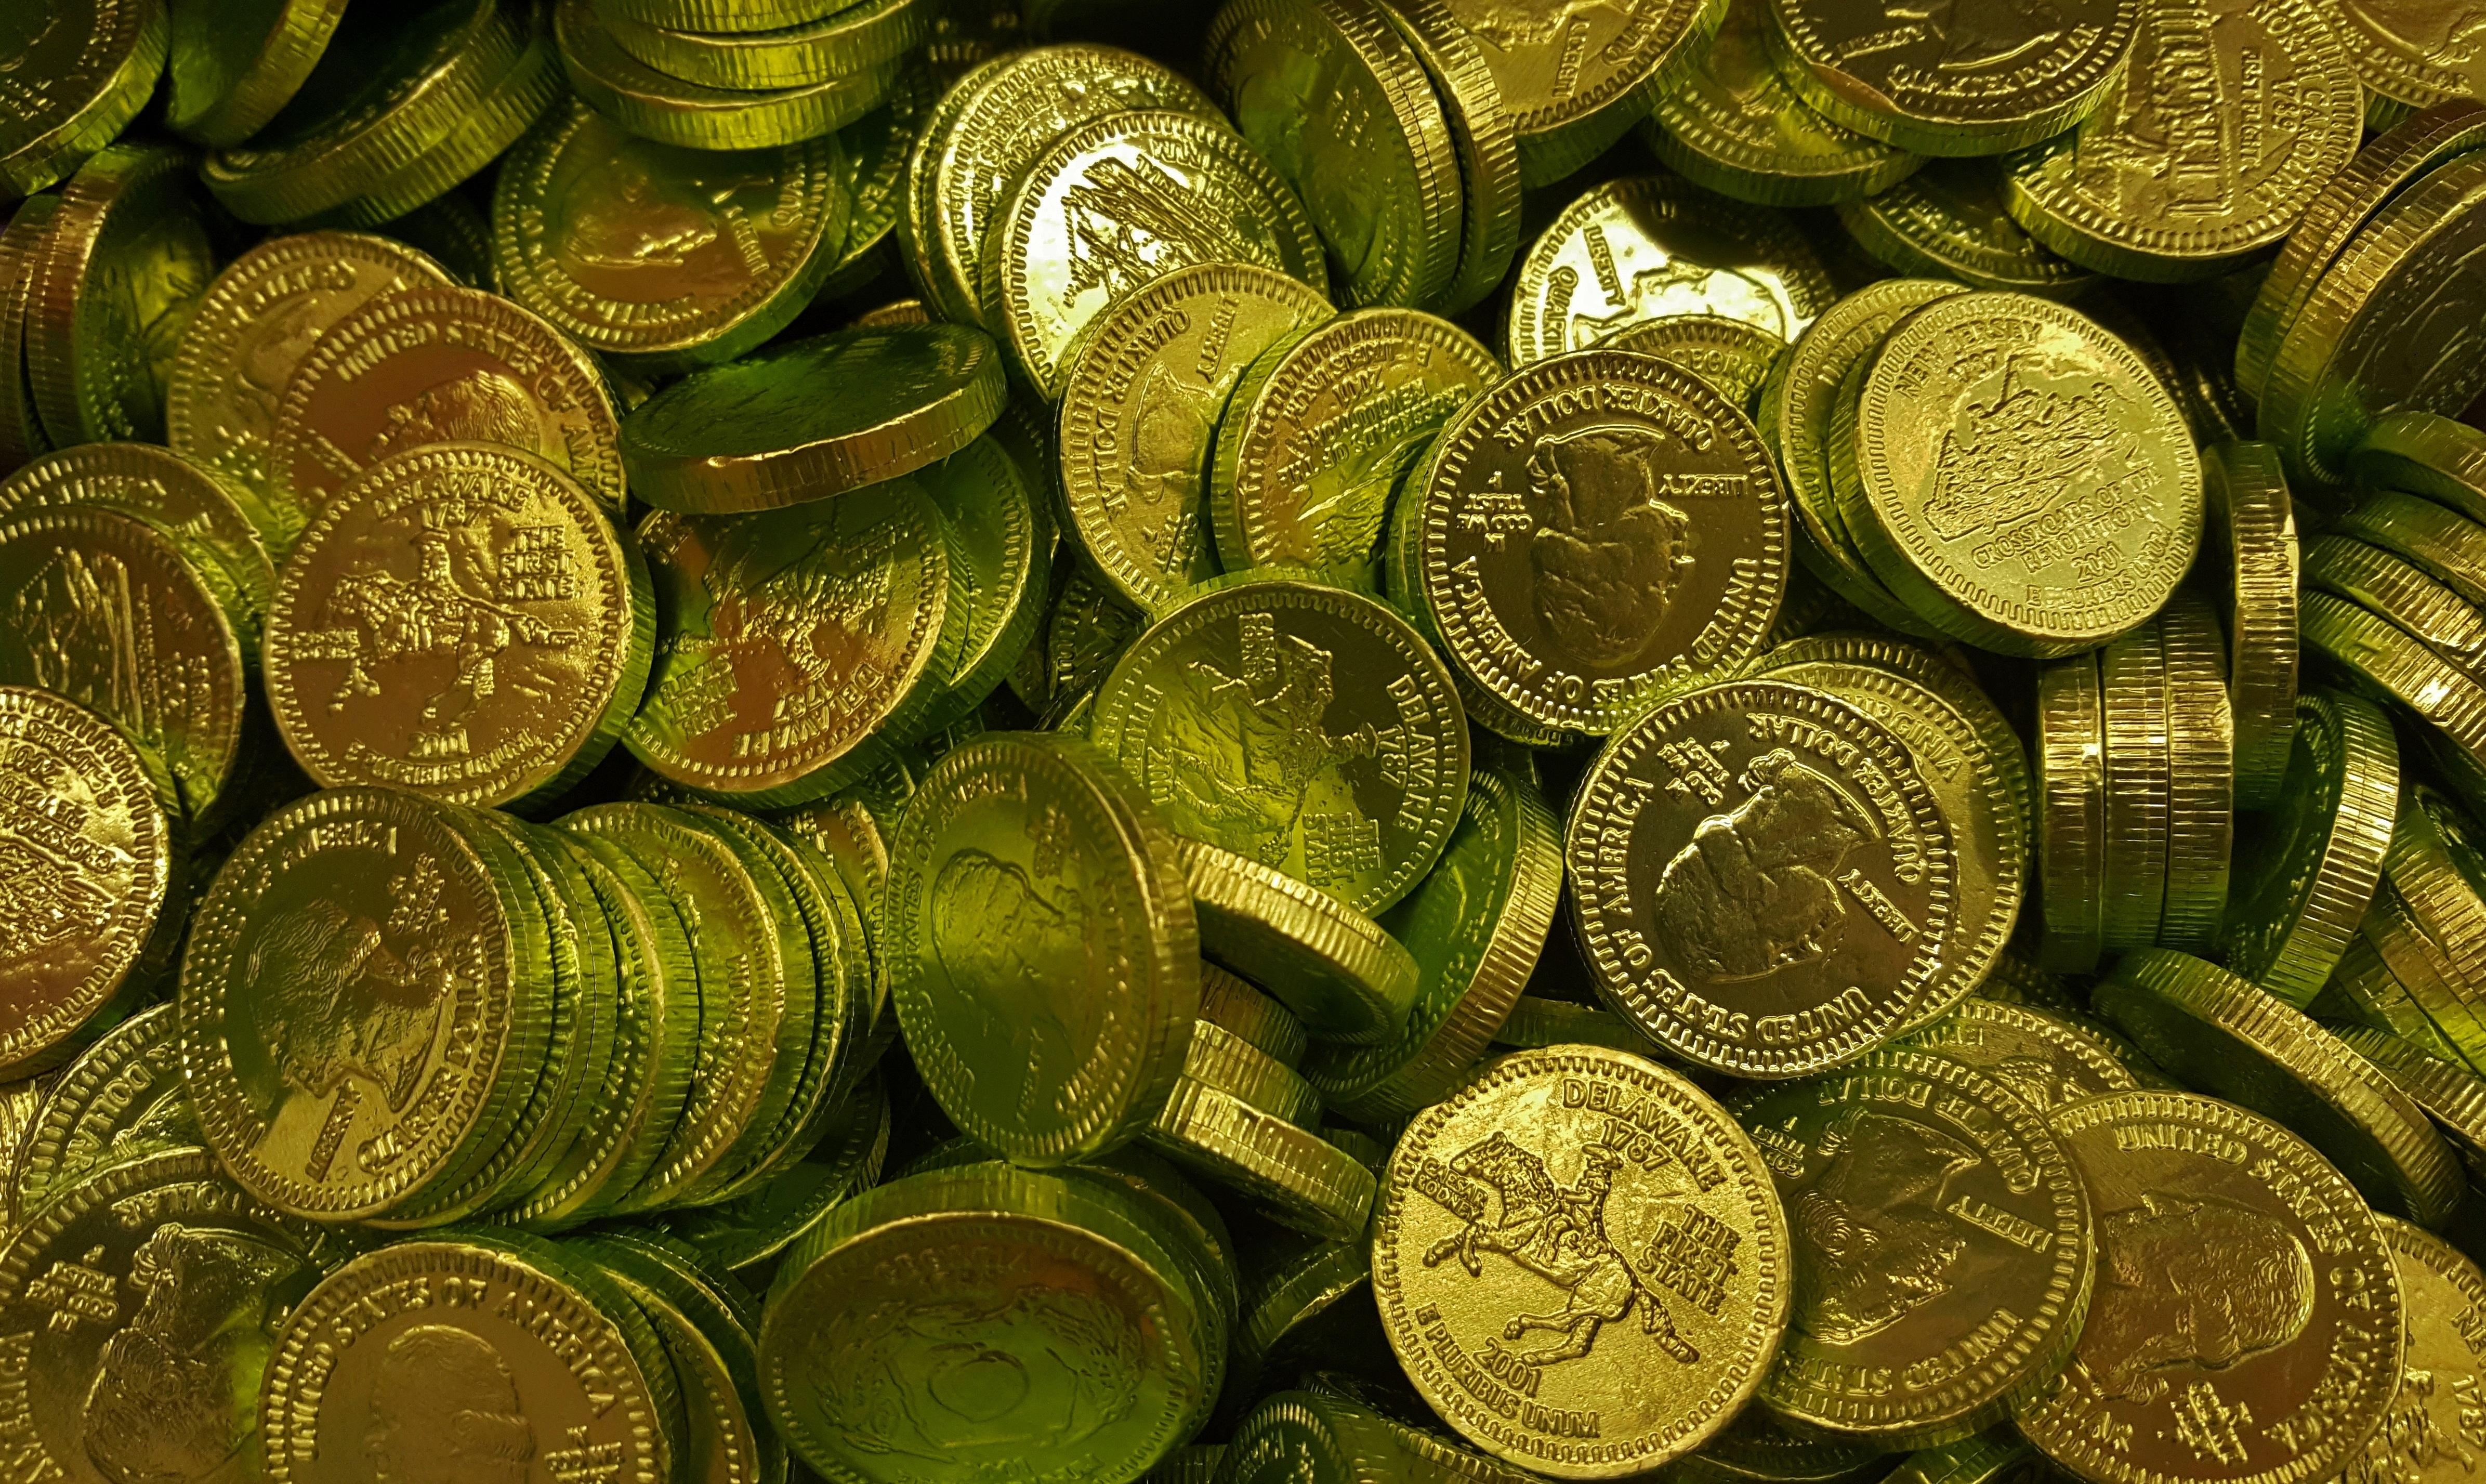 Free Images Green Golden Metal Money Chocolate